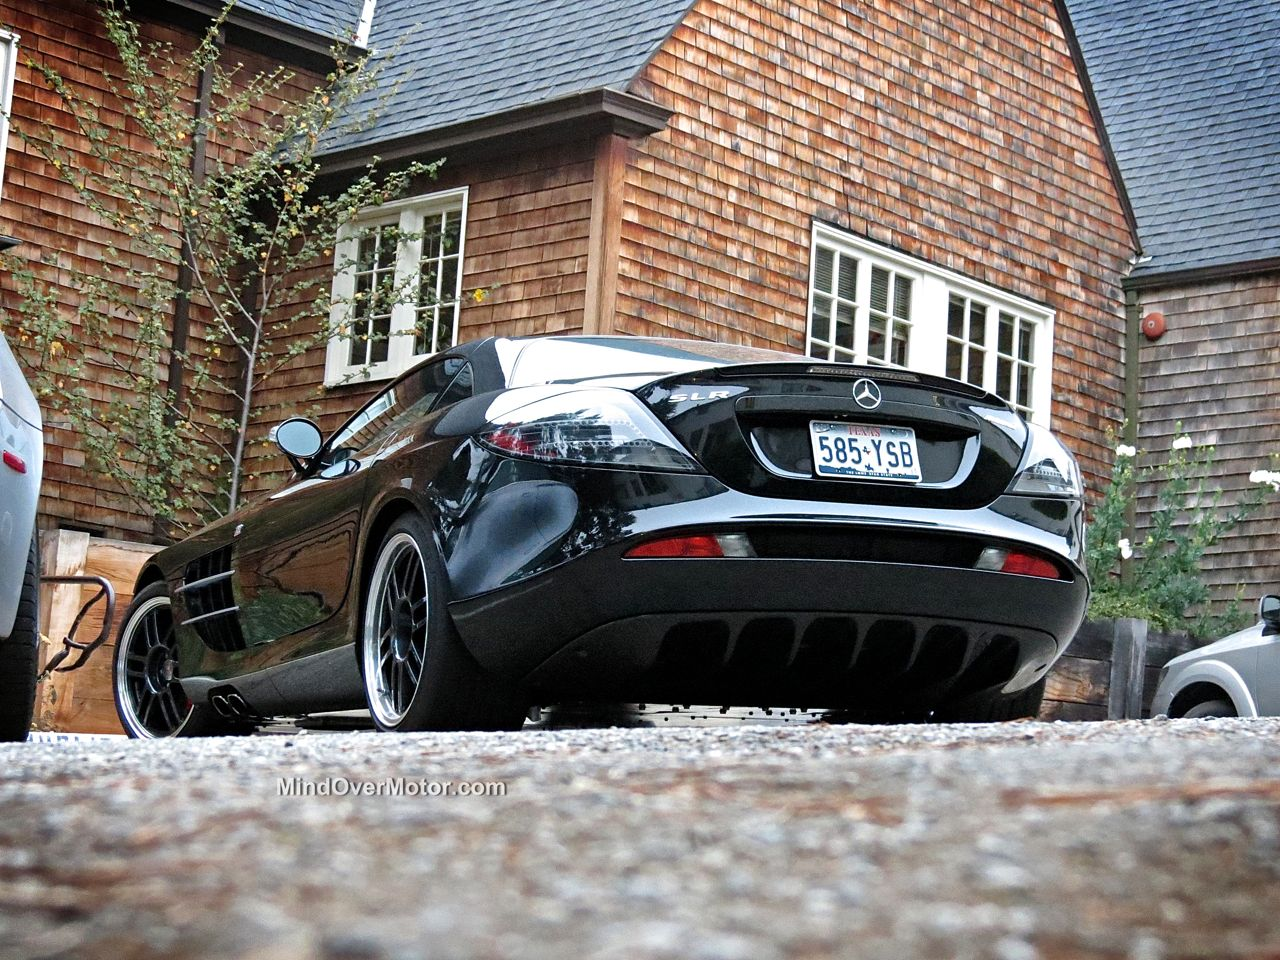 Mercedes SLR 722 Rear